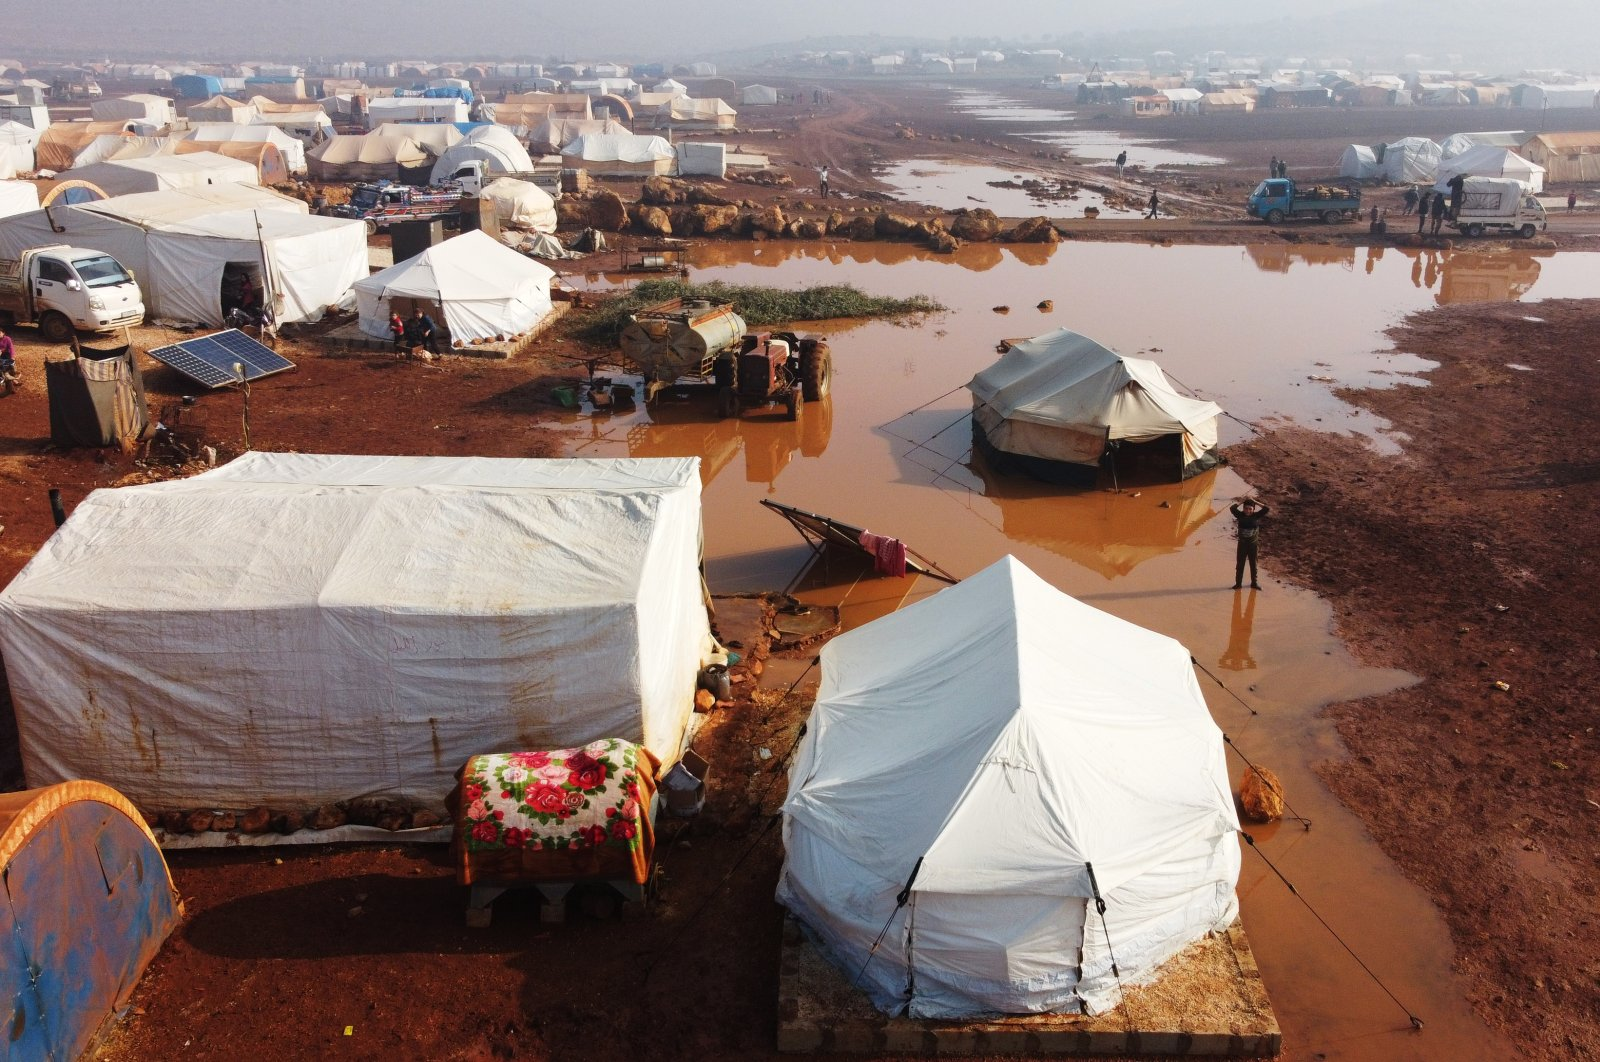 Heavy rain floods Keferarouk refugee camp in northwestern Idlib, Syria, Dec.19, 2020. (AA)